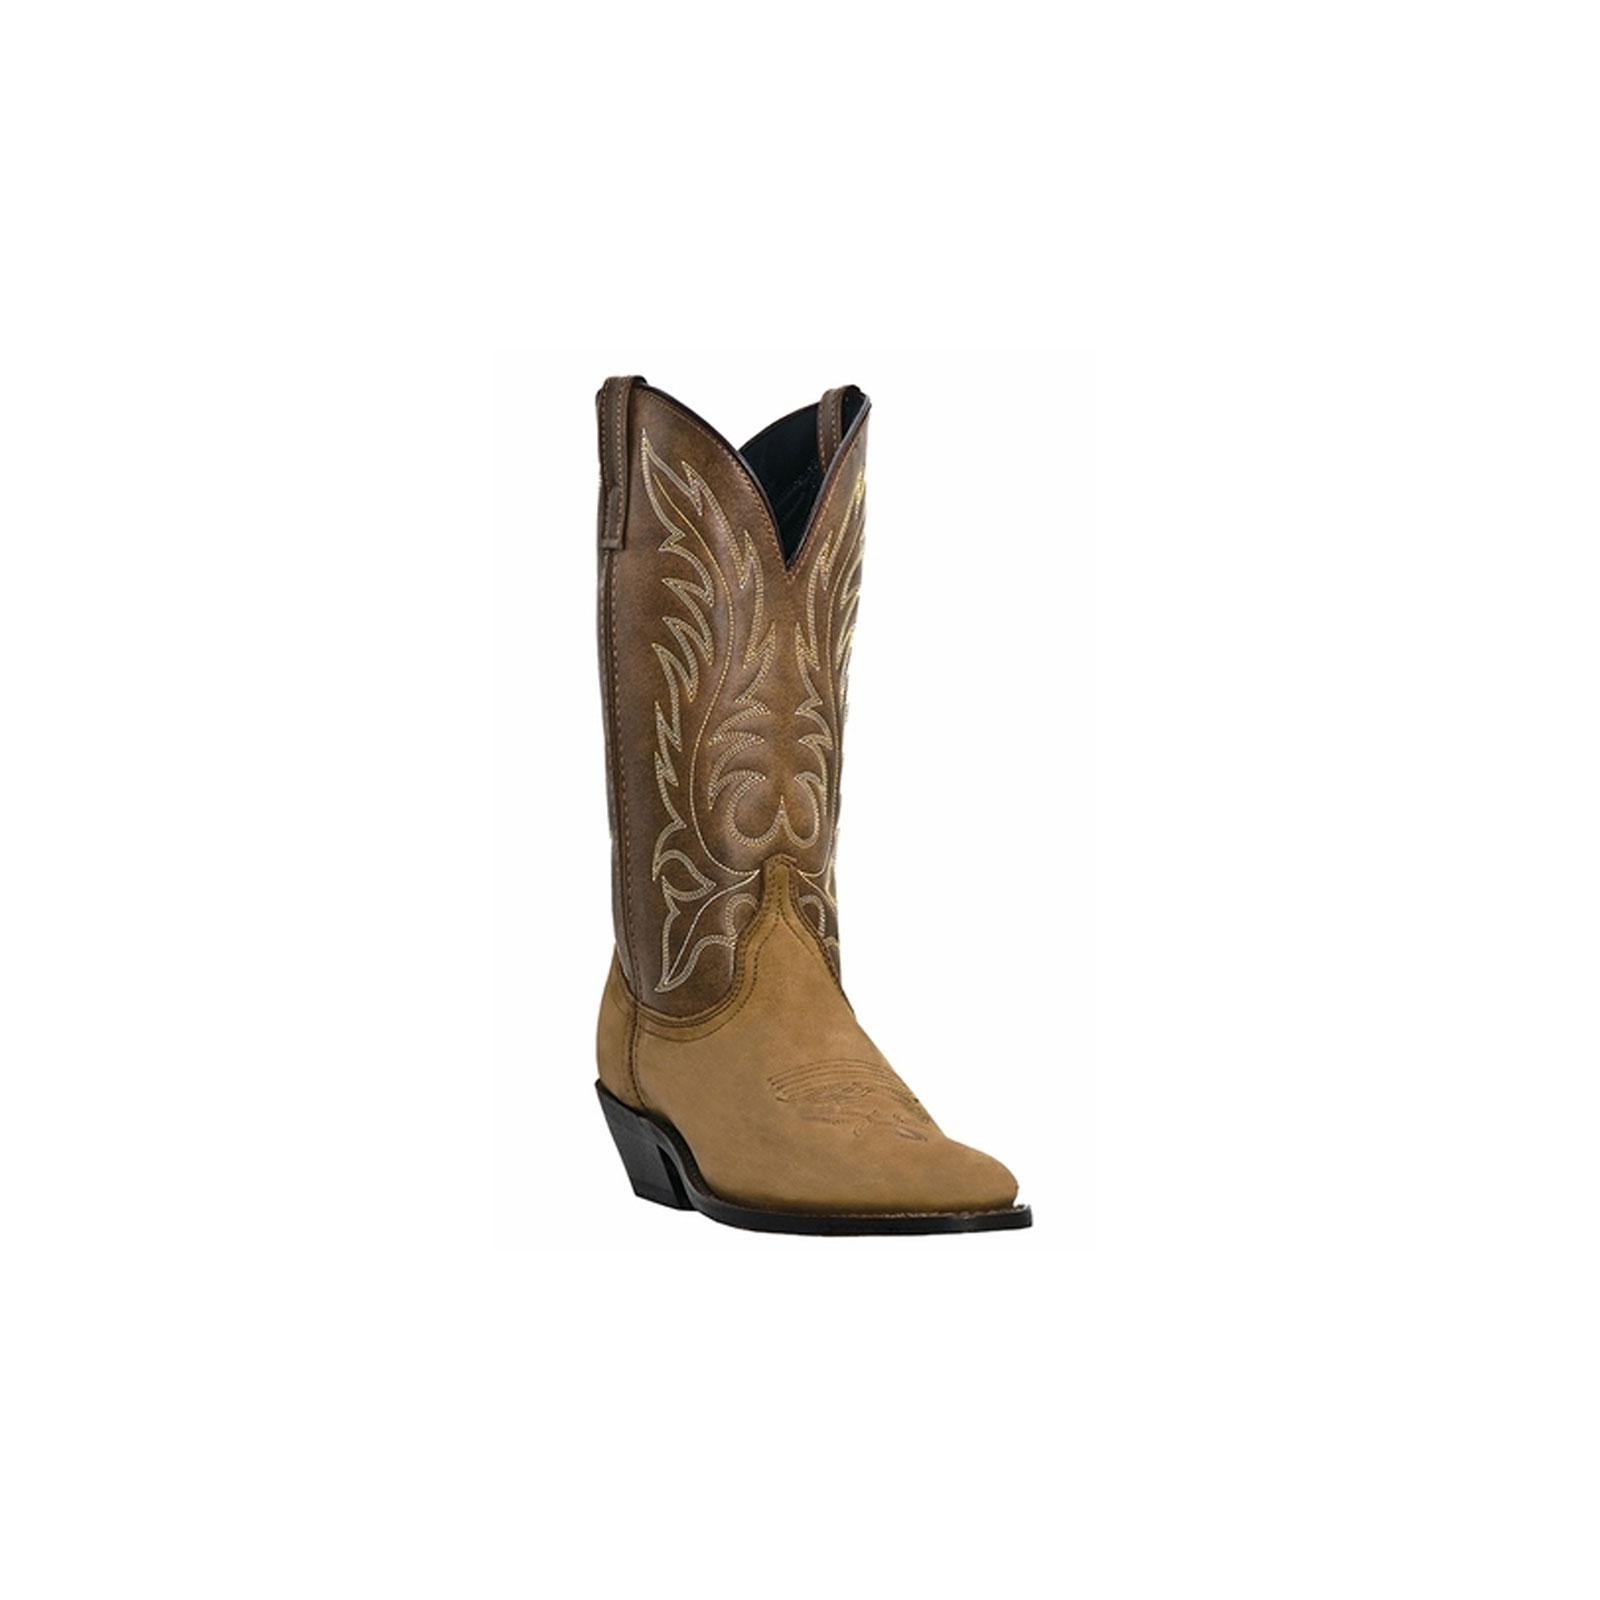 Laredo 5742 Women's Tan Distressed Kadi Western Boots by Laredo